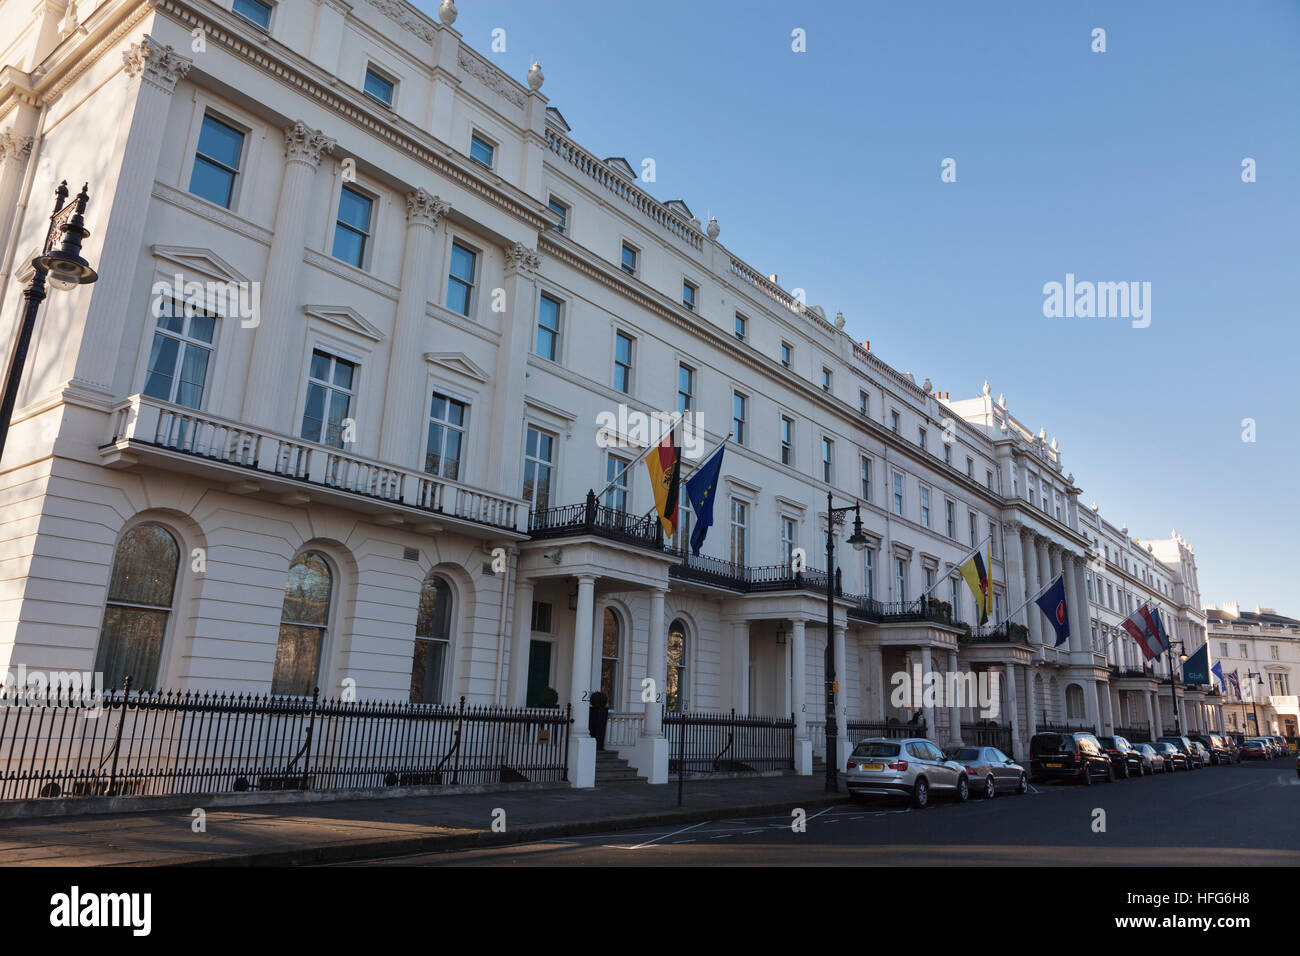 german embassy stockfotos german embassy bilder alamy. Black Bedroom Furniture Sets. Home Design Ideas